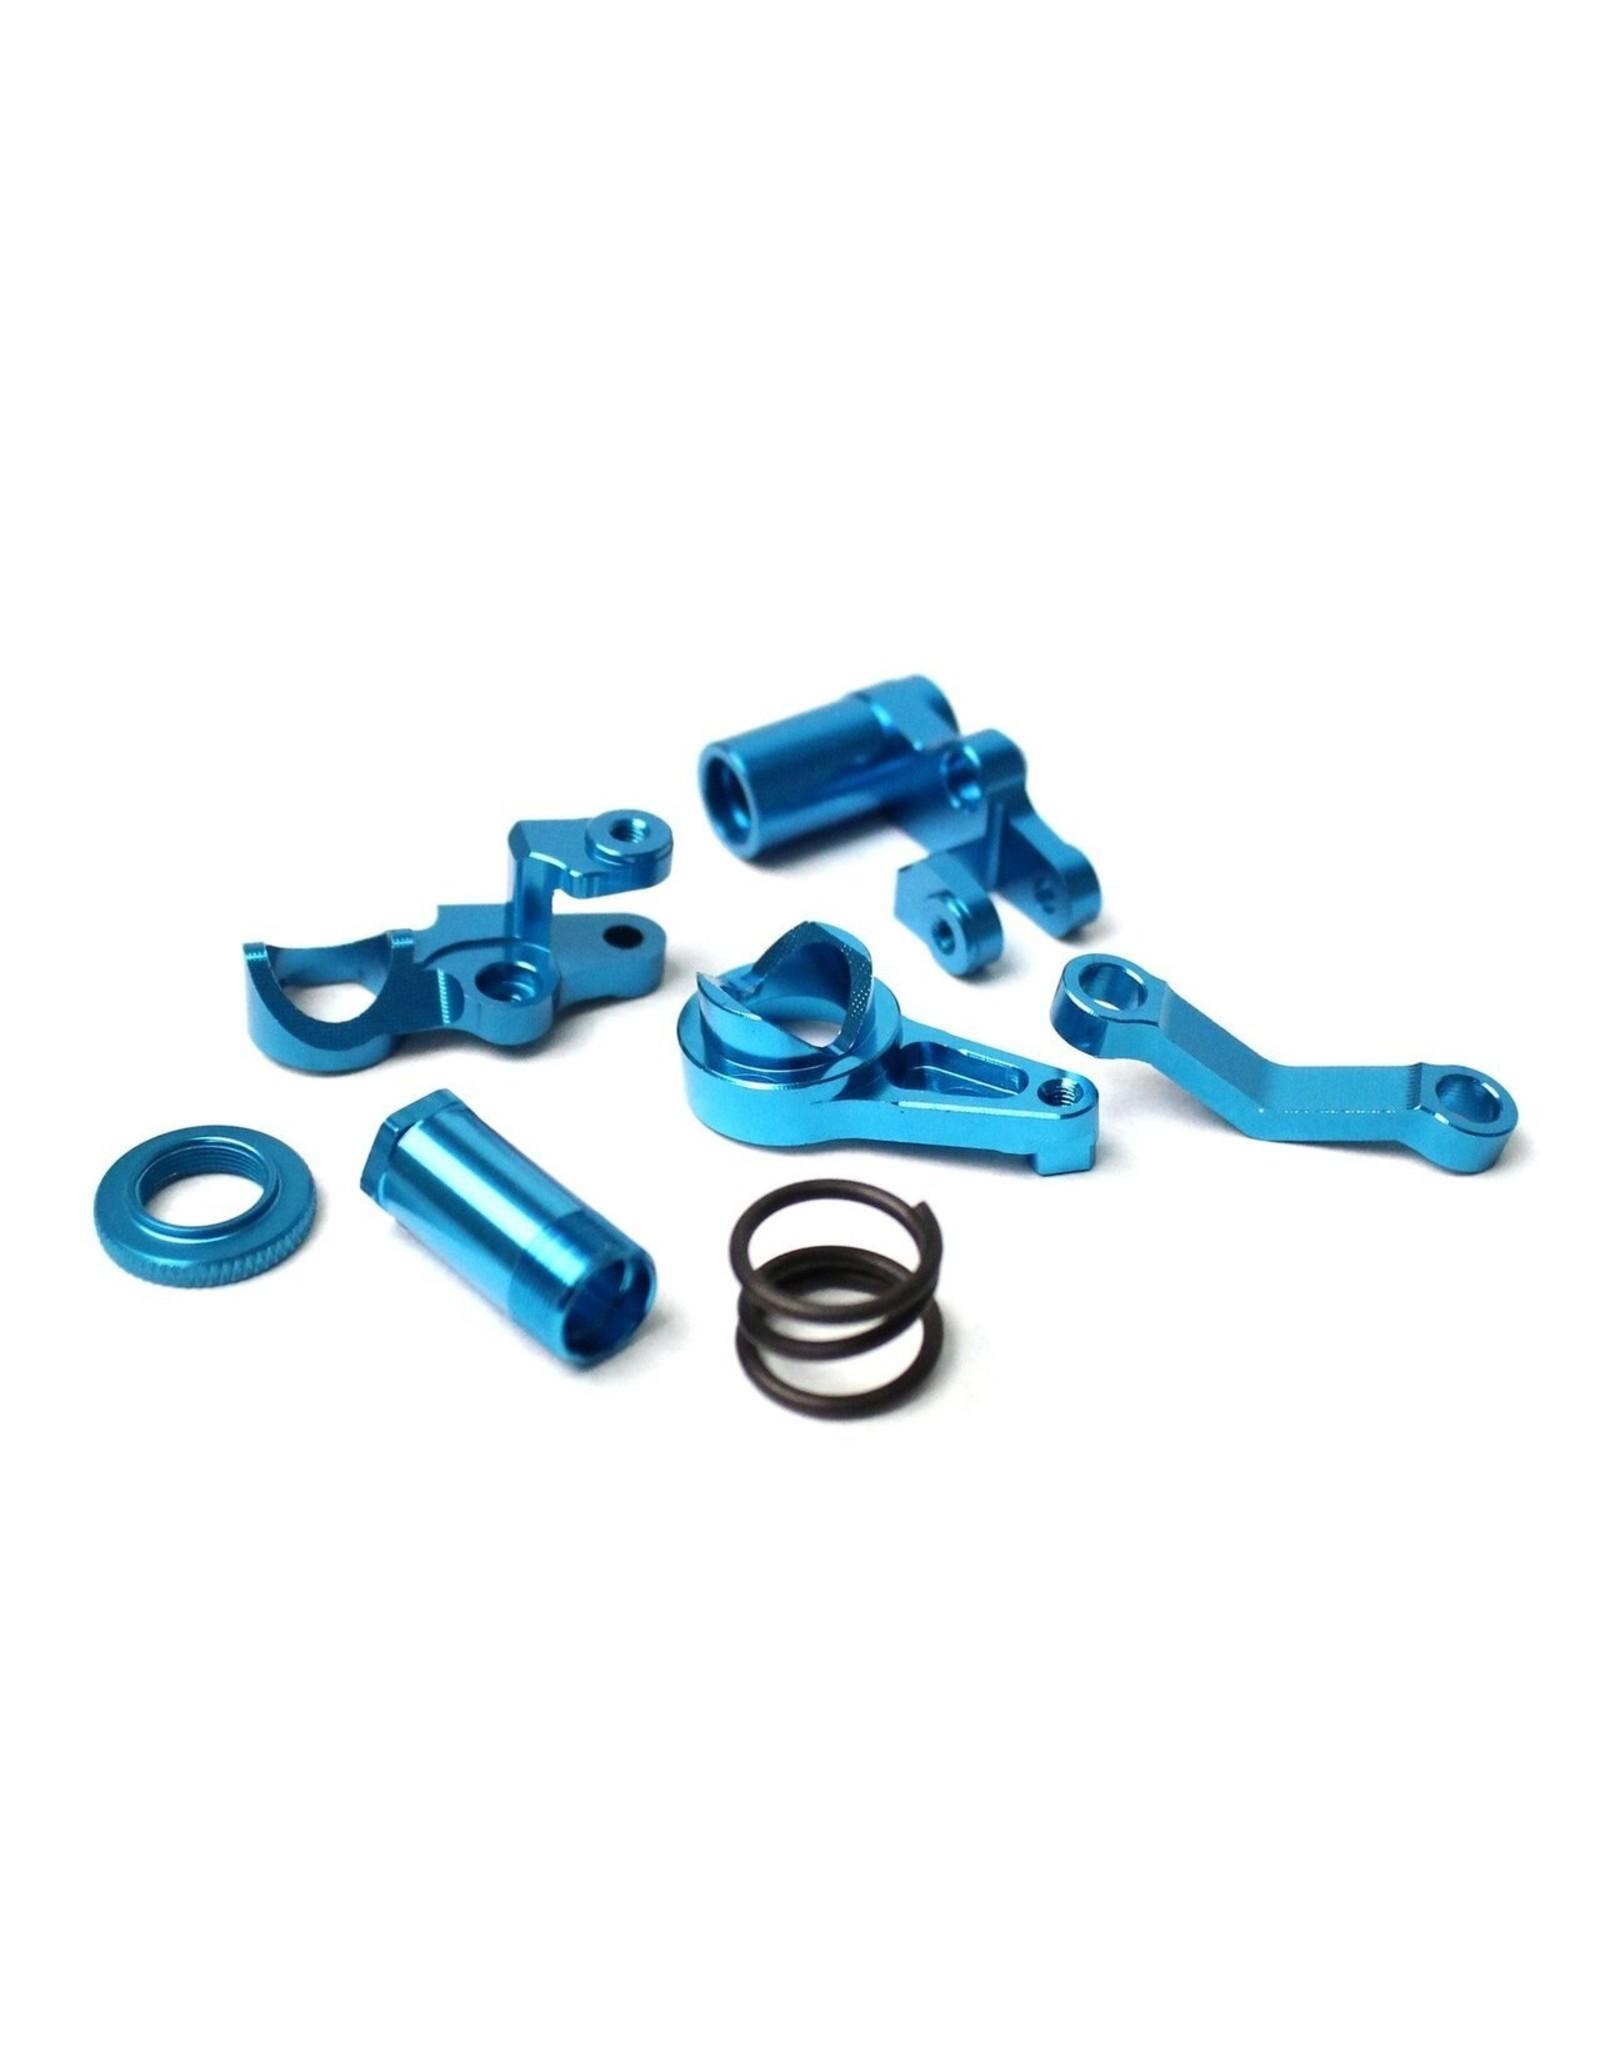 Racers Edge Slash 4WD Aluminum Servo Saver Blue  (RCE1846BL)